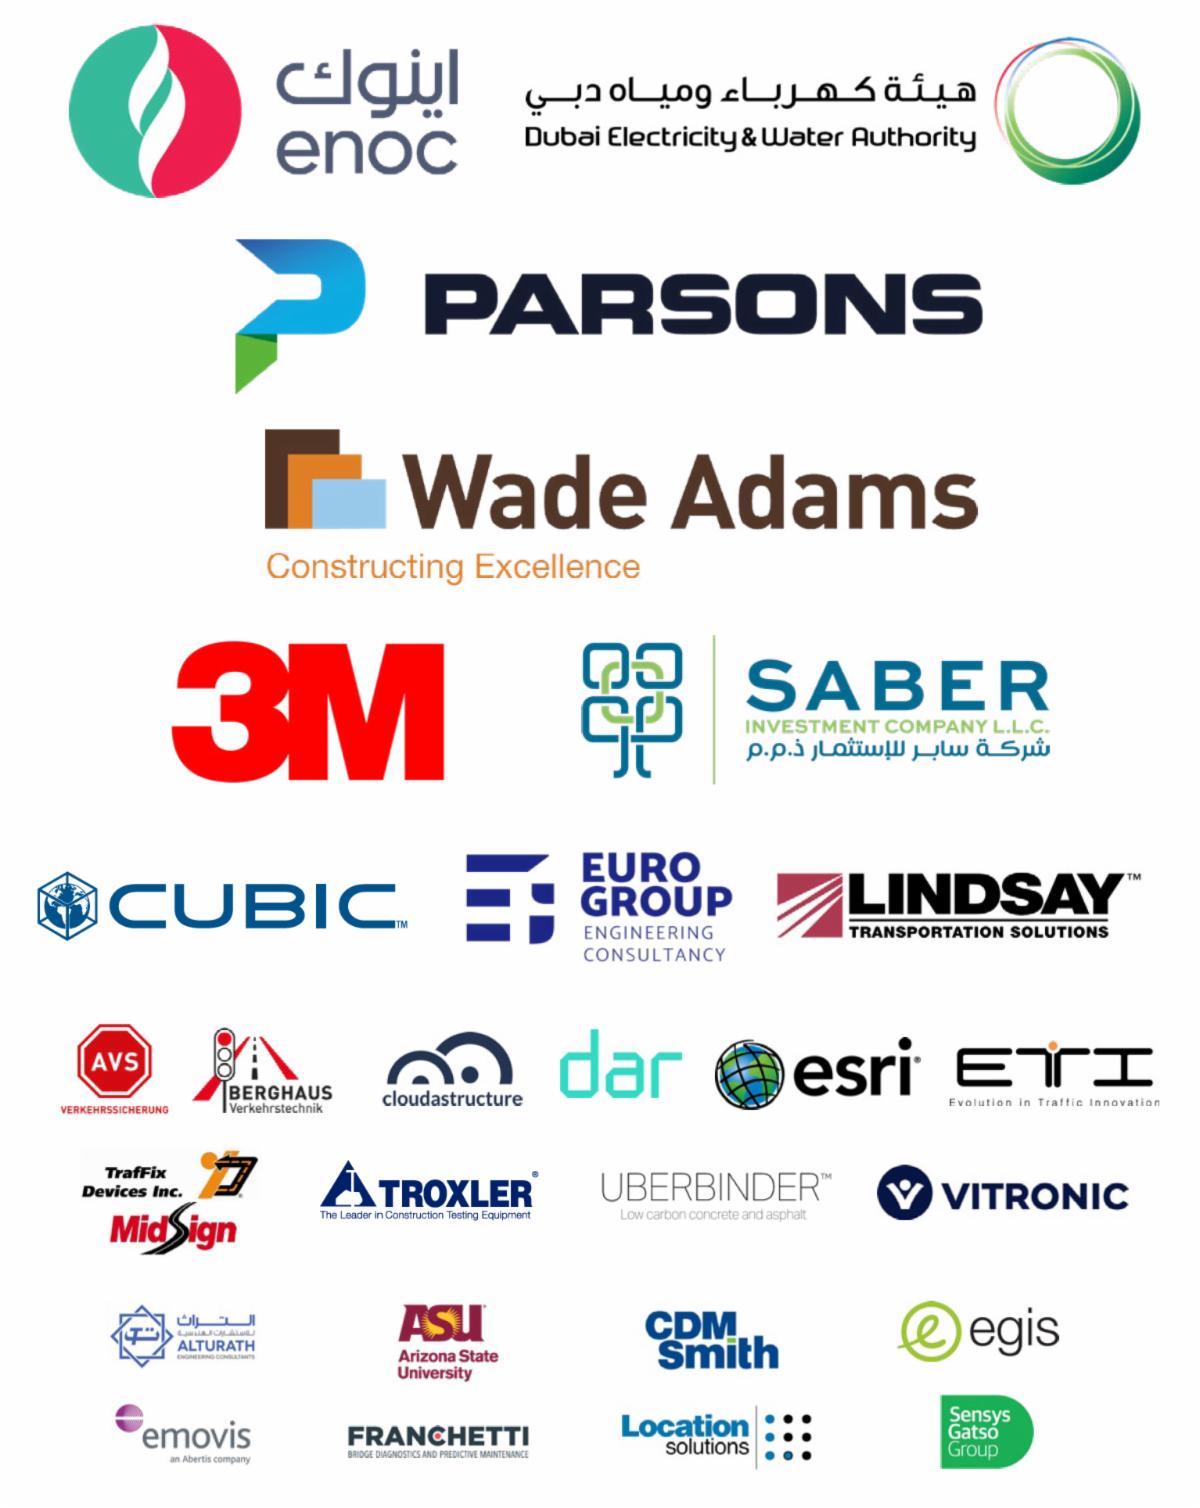 wm18-sponsors.png